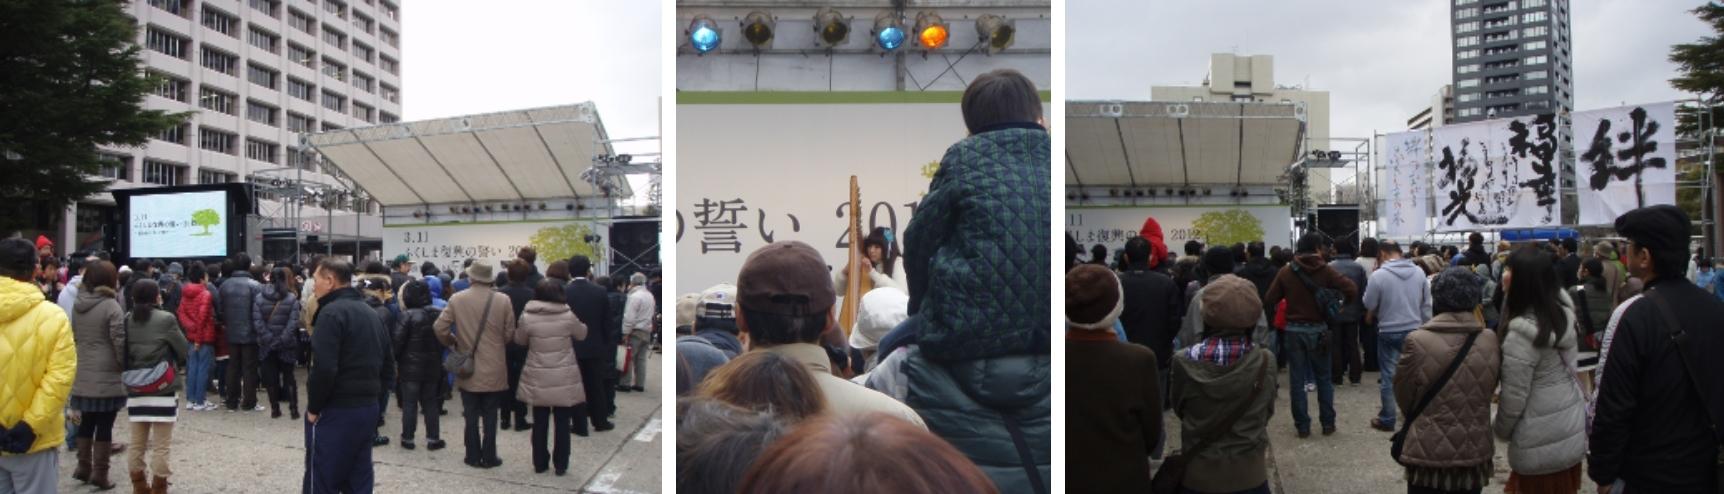 fukushima-soundscapes-koji-nagahata-110312